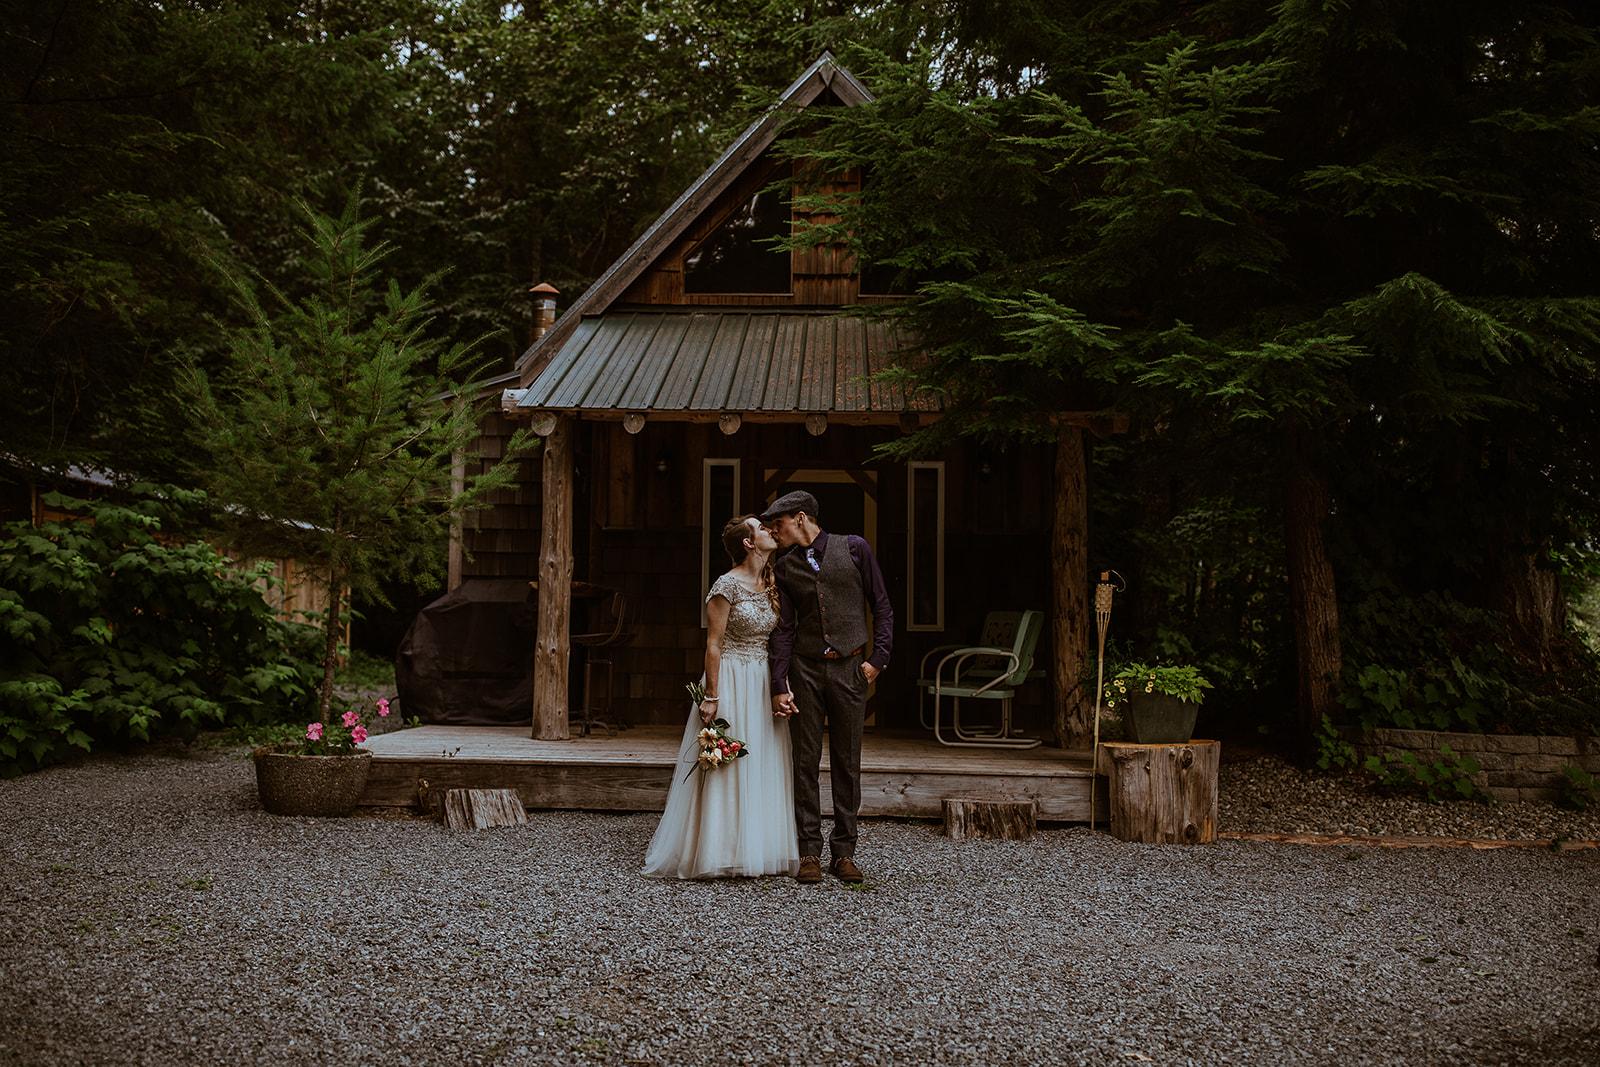 mount-rainier-cabin-elopement-megan-gallagher-photography_(179_of_568).jpg